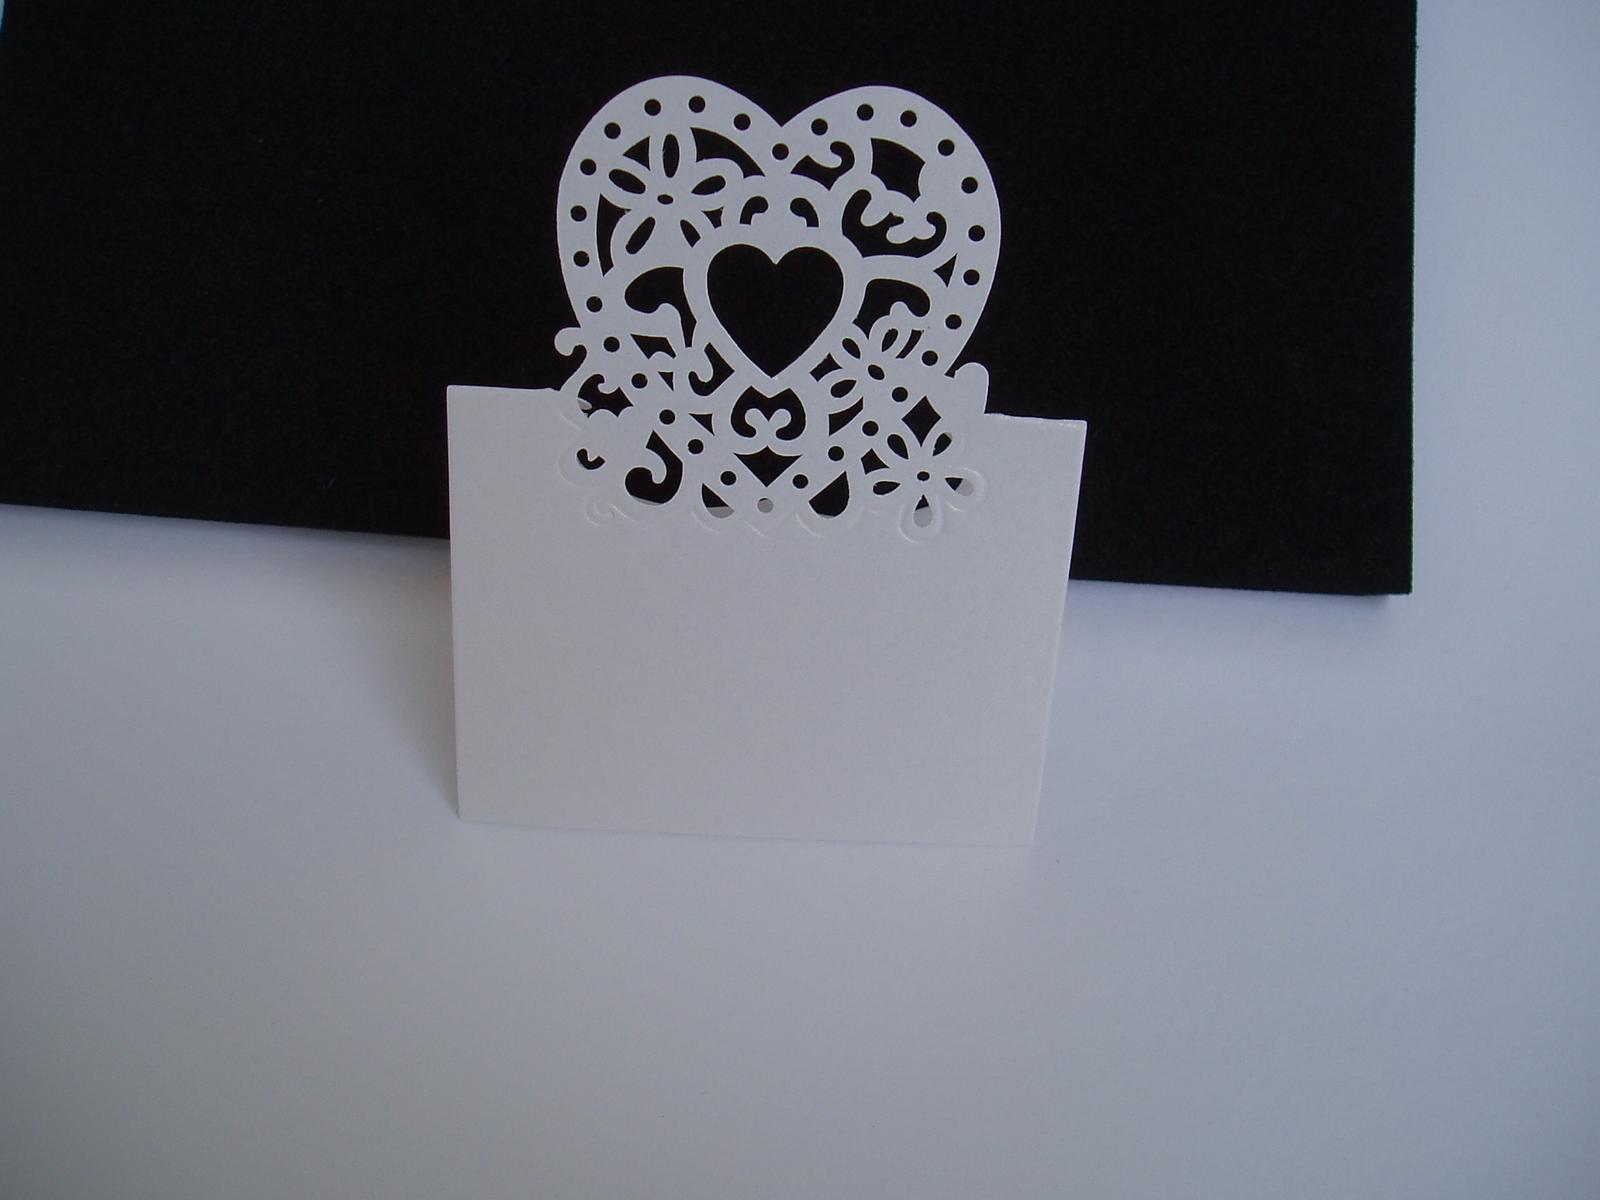 jmenovka-srdce - Obrázek č. 1